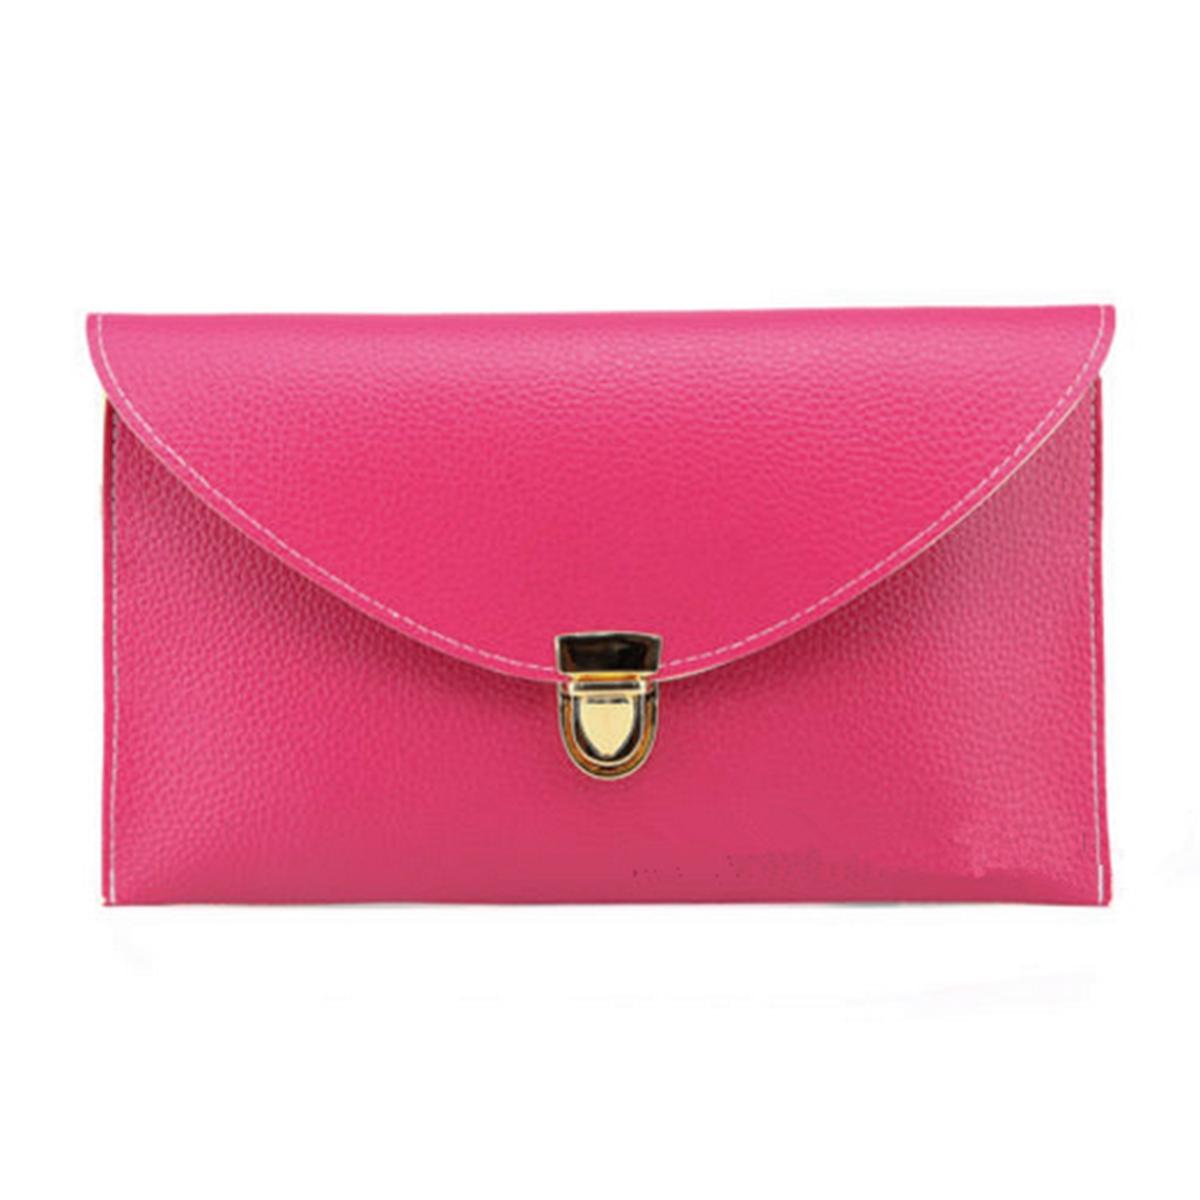 Women Lady Leather Clutch Chain Shoulder Handbag Tote Envelope Purse Handbag HOT